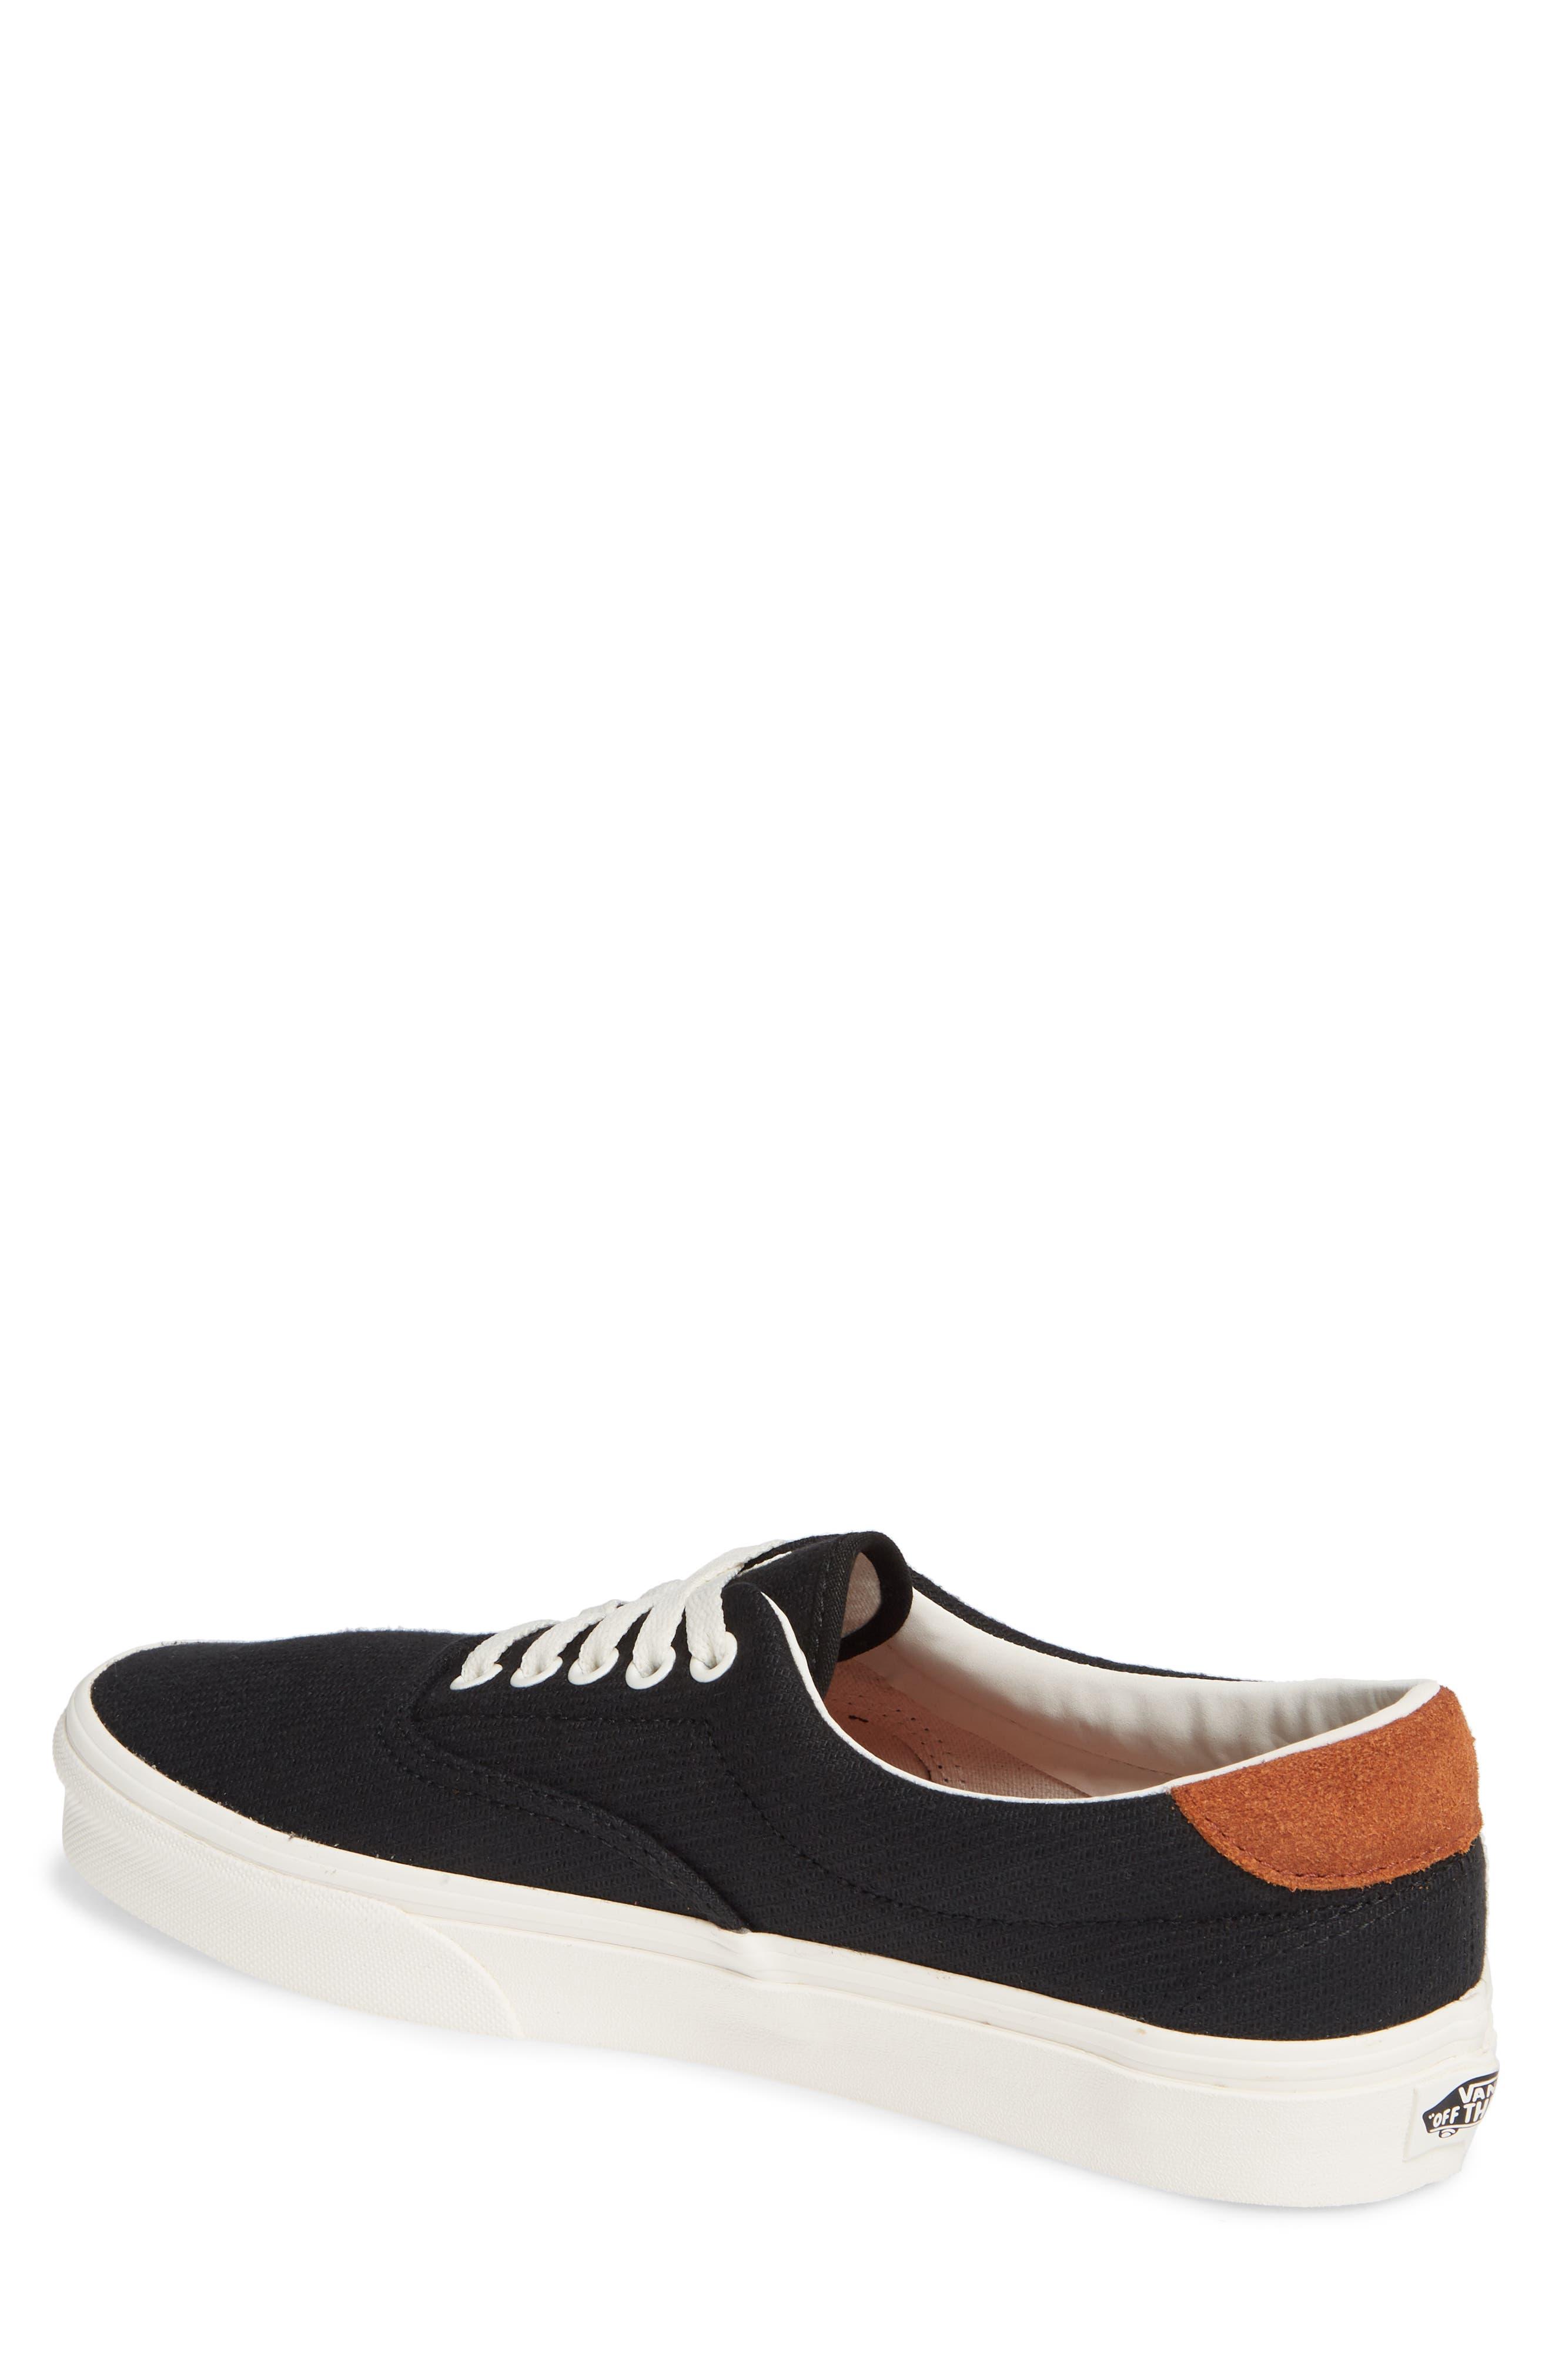 Flannel Era Sneaker,                             Alternate thumbnail 2, color,                             BLACK FLANNEL FLANNEL